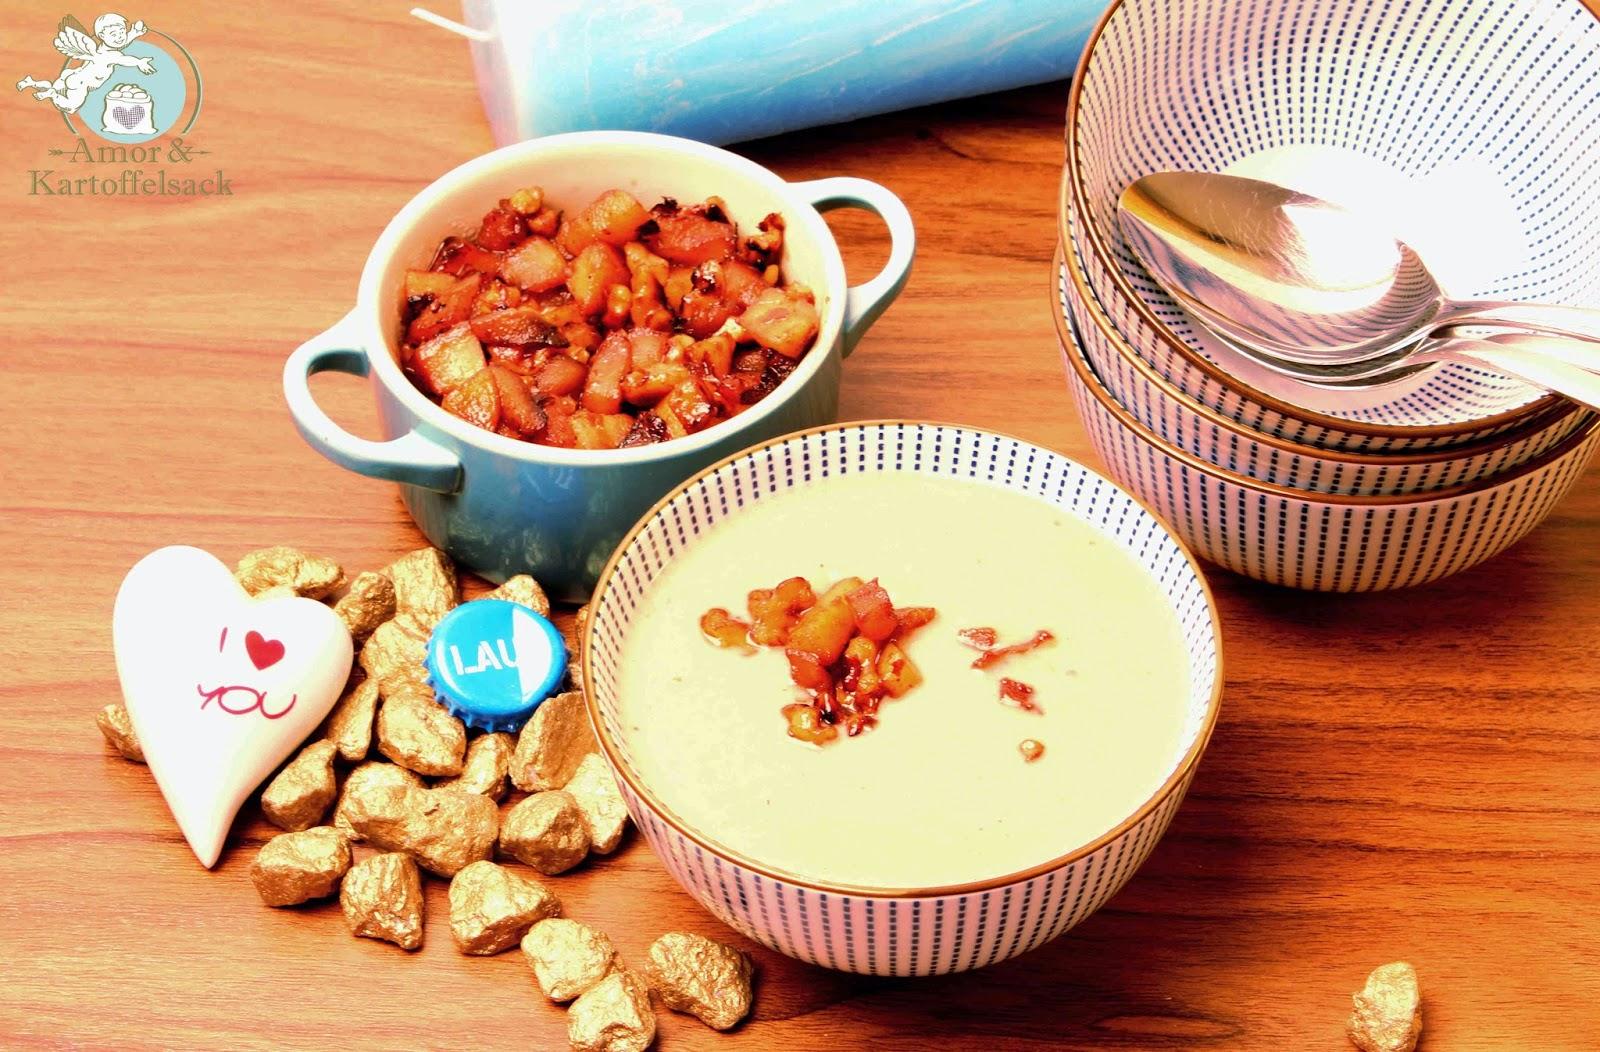 cremige Suppe ohne Sahne oder Milch